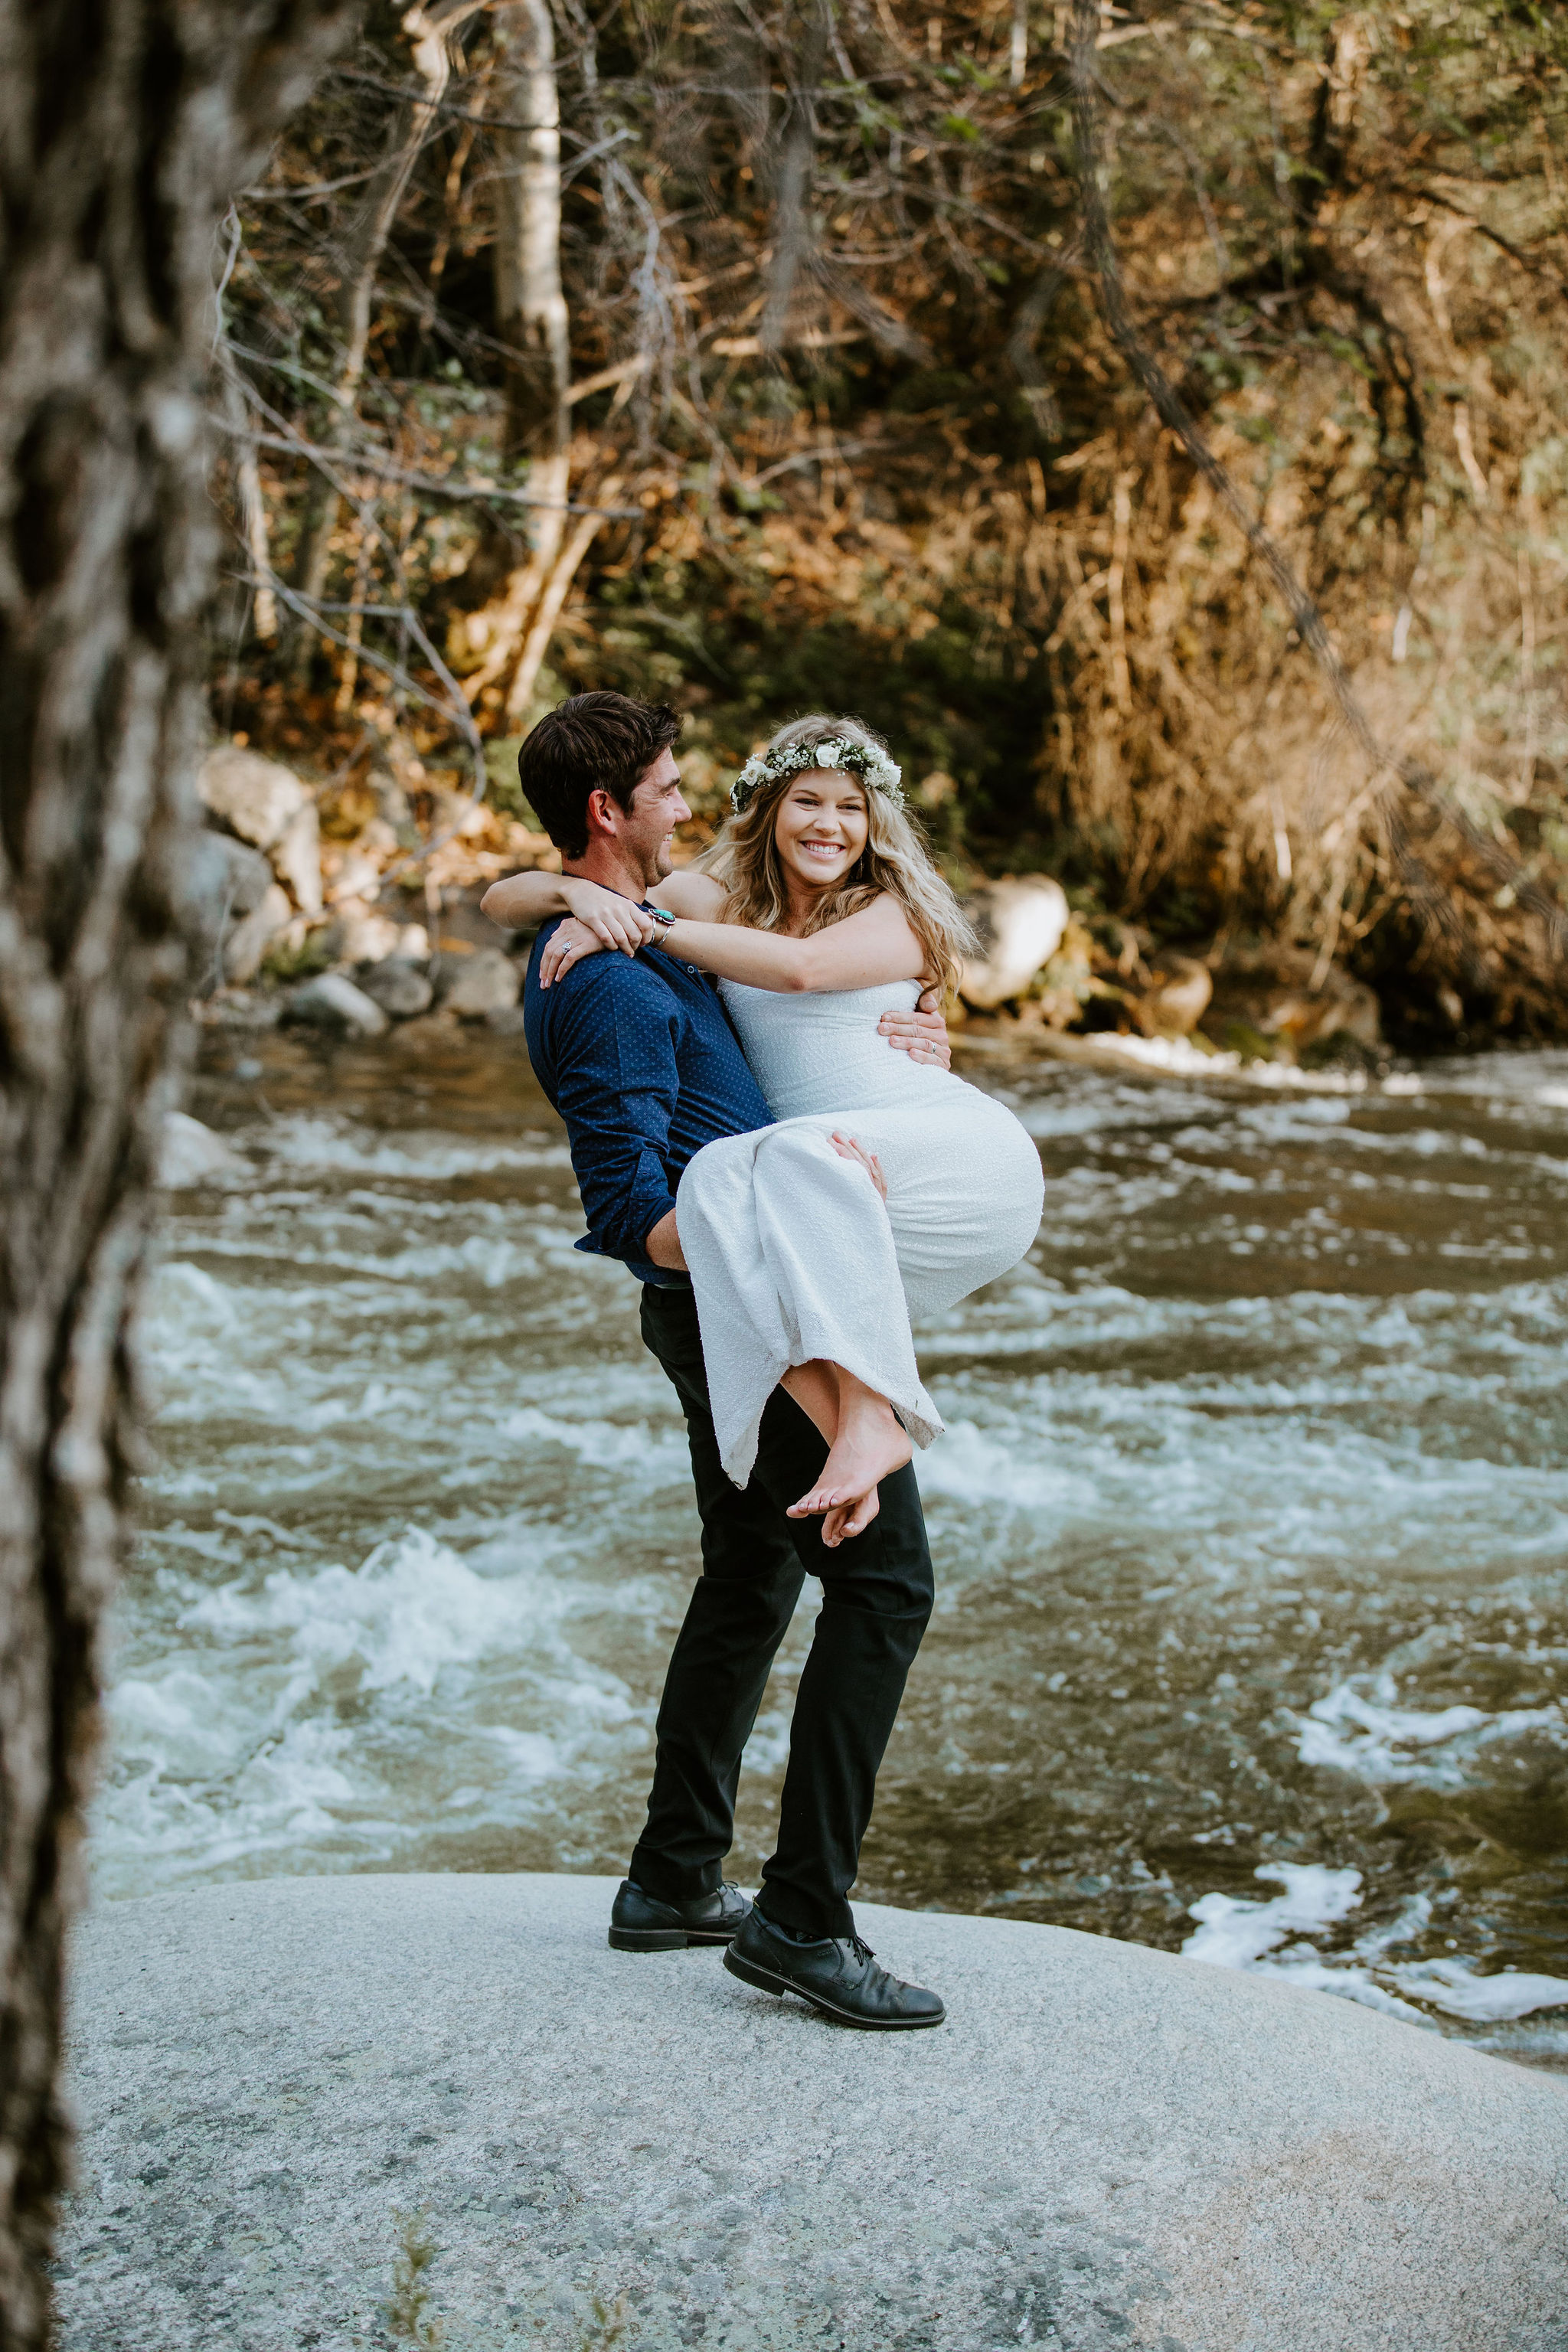 RedwoodRanch_Geoff&LyndsiPhotography_Mike&Amanda_Romantics74.jpg